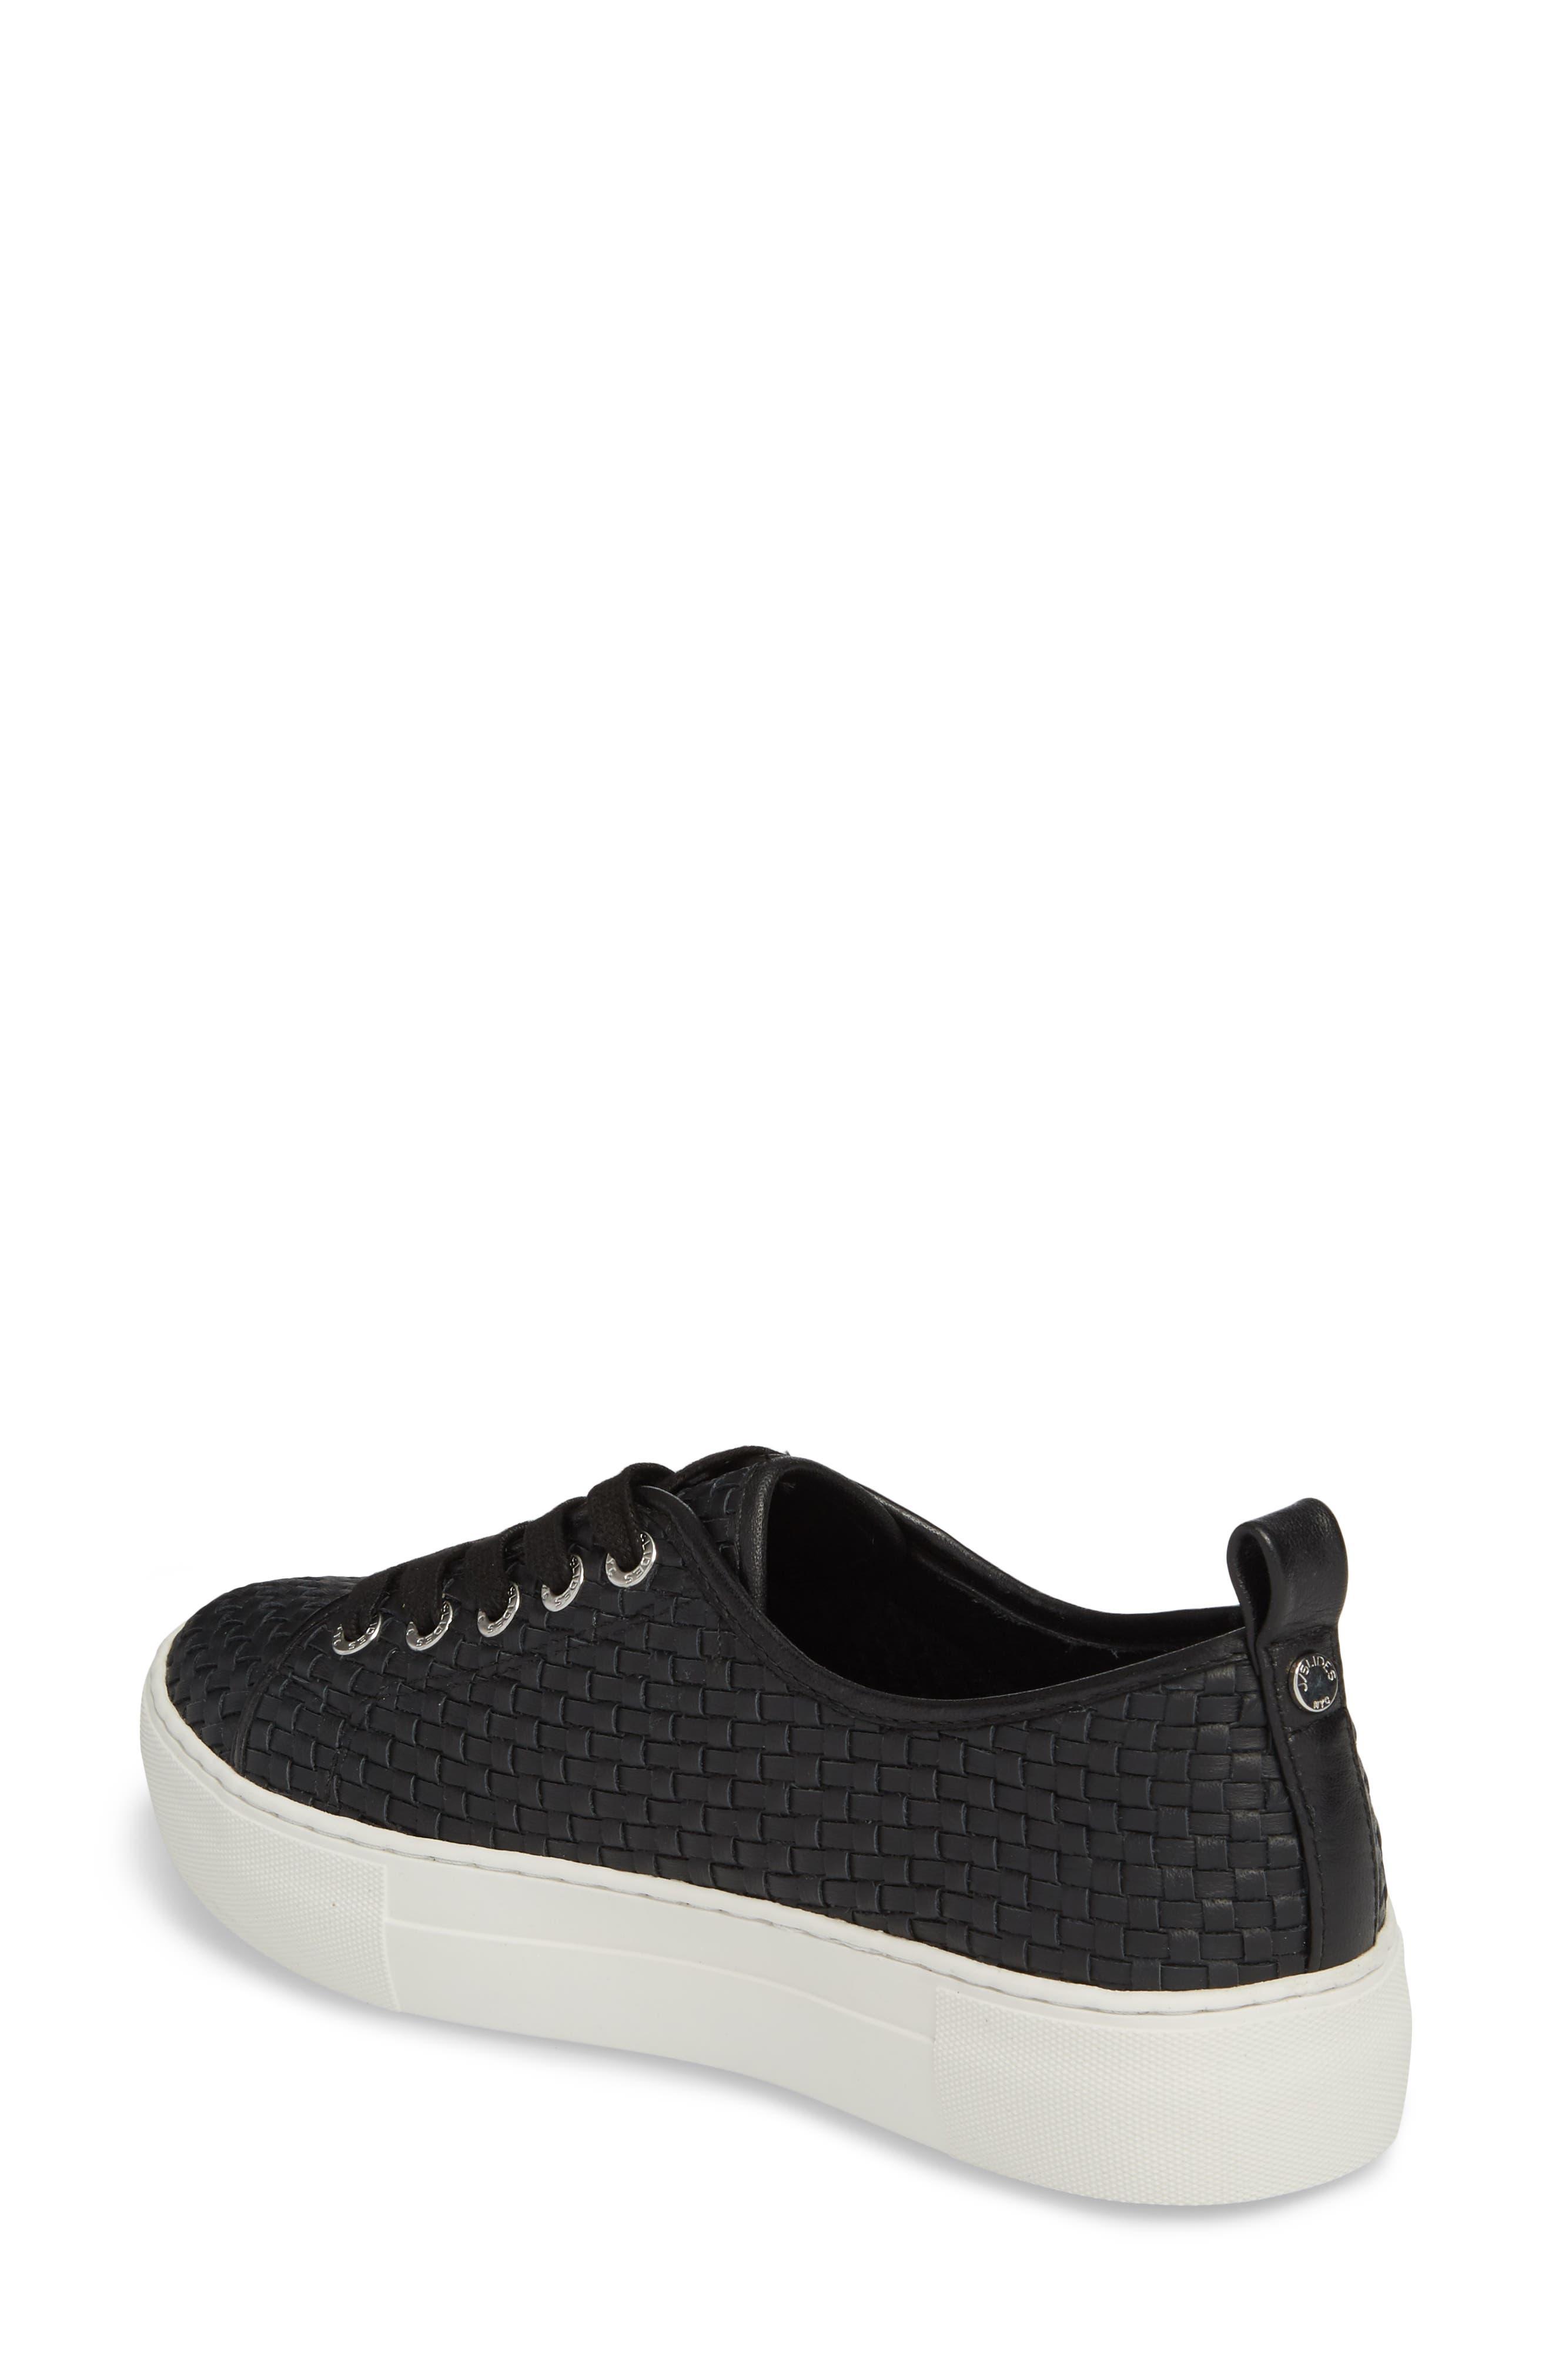 Artsy Woven Platform Sneaker,                             Alternate thumbnail 2, color,                             BLACK LEATHER